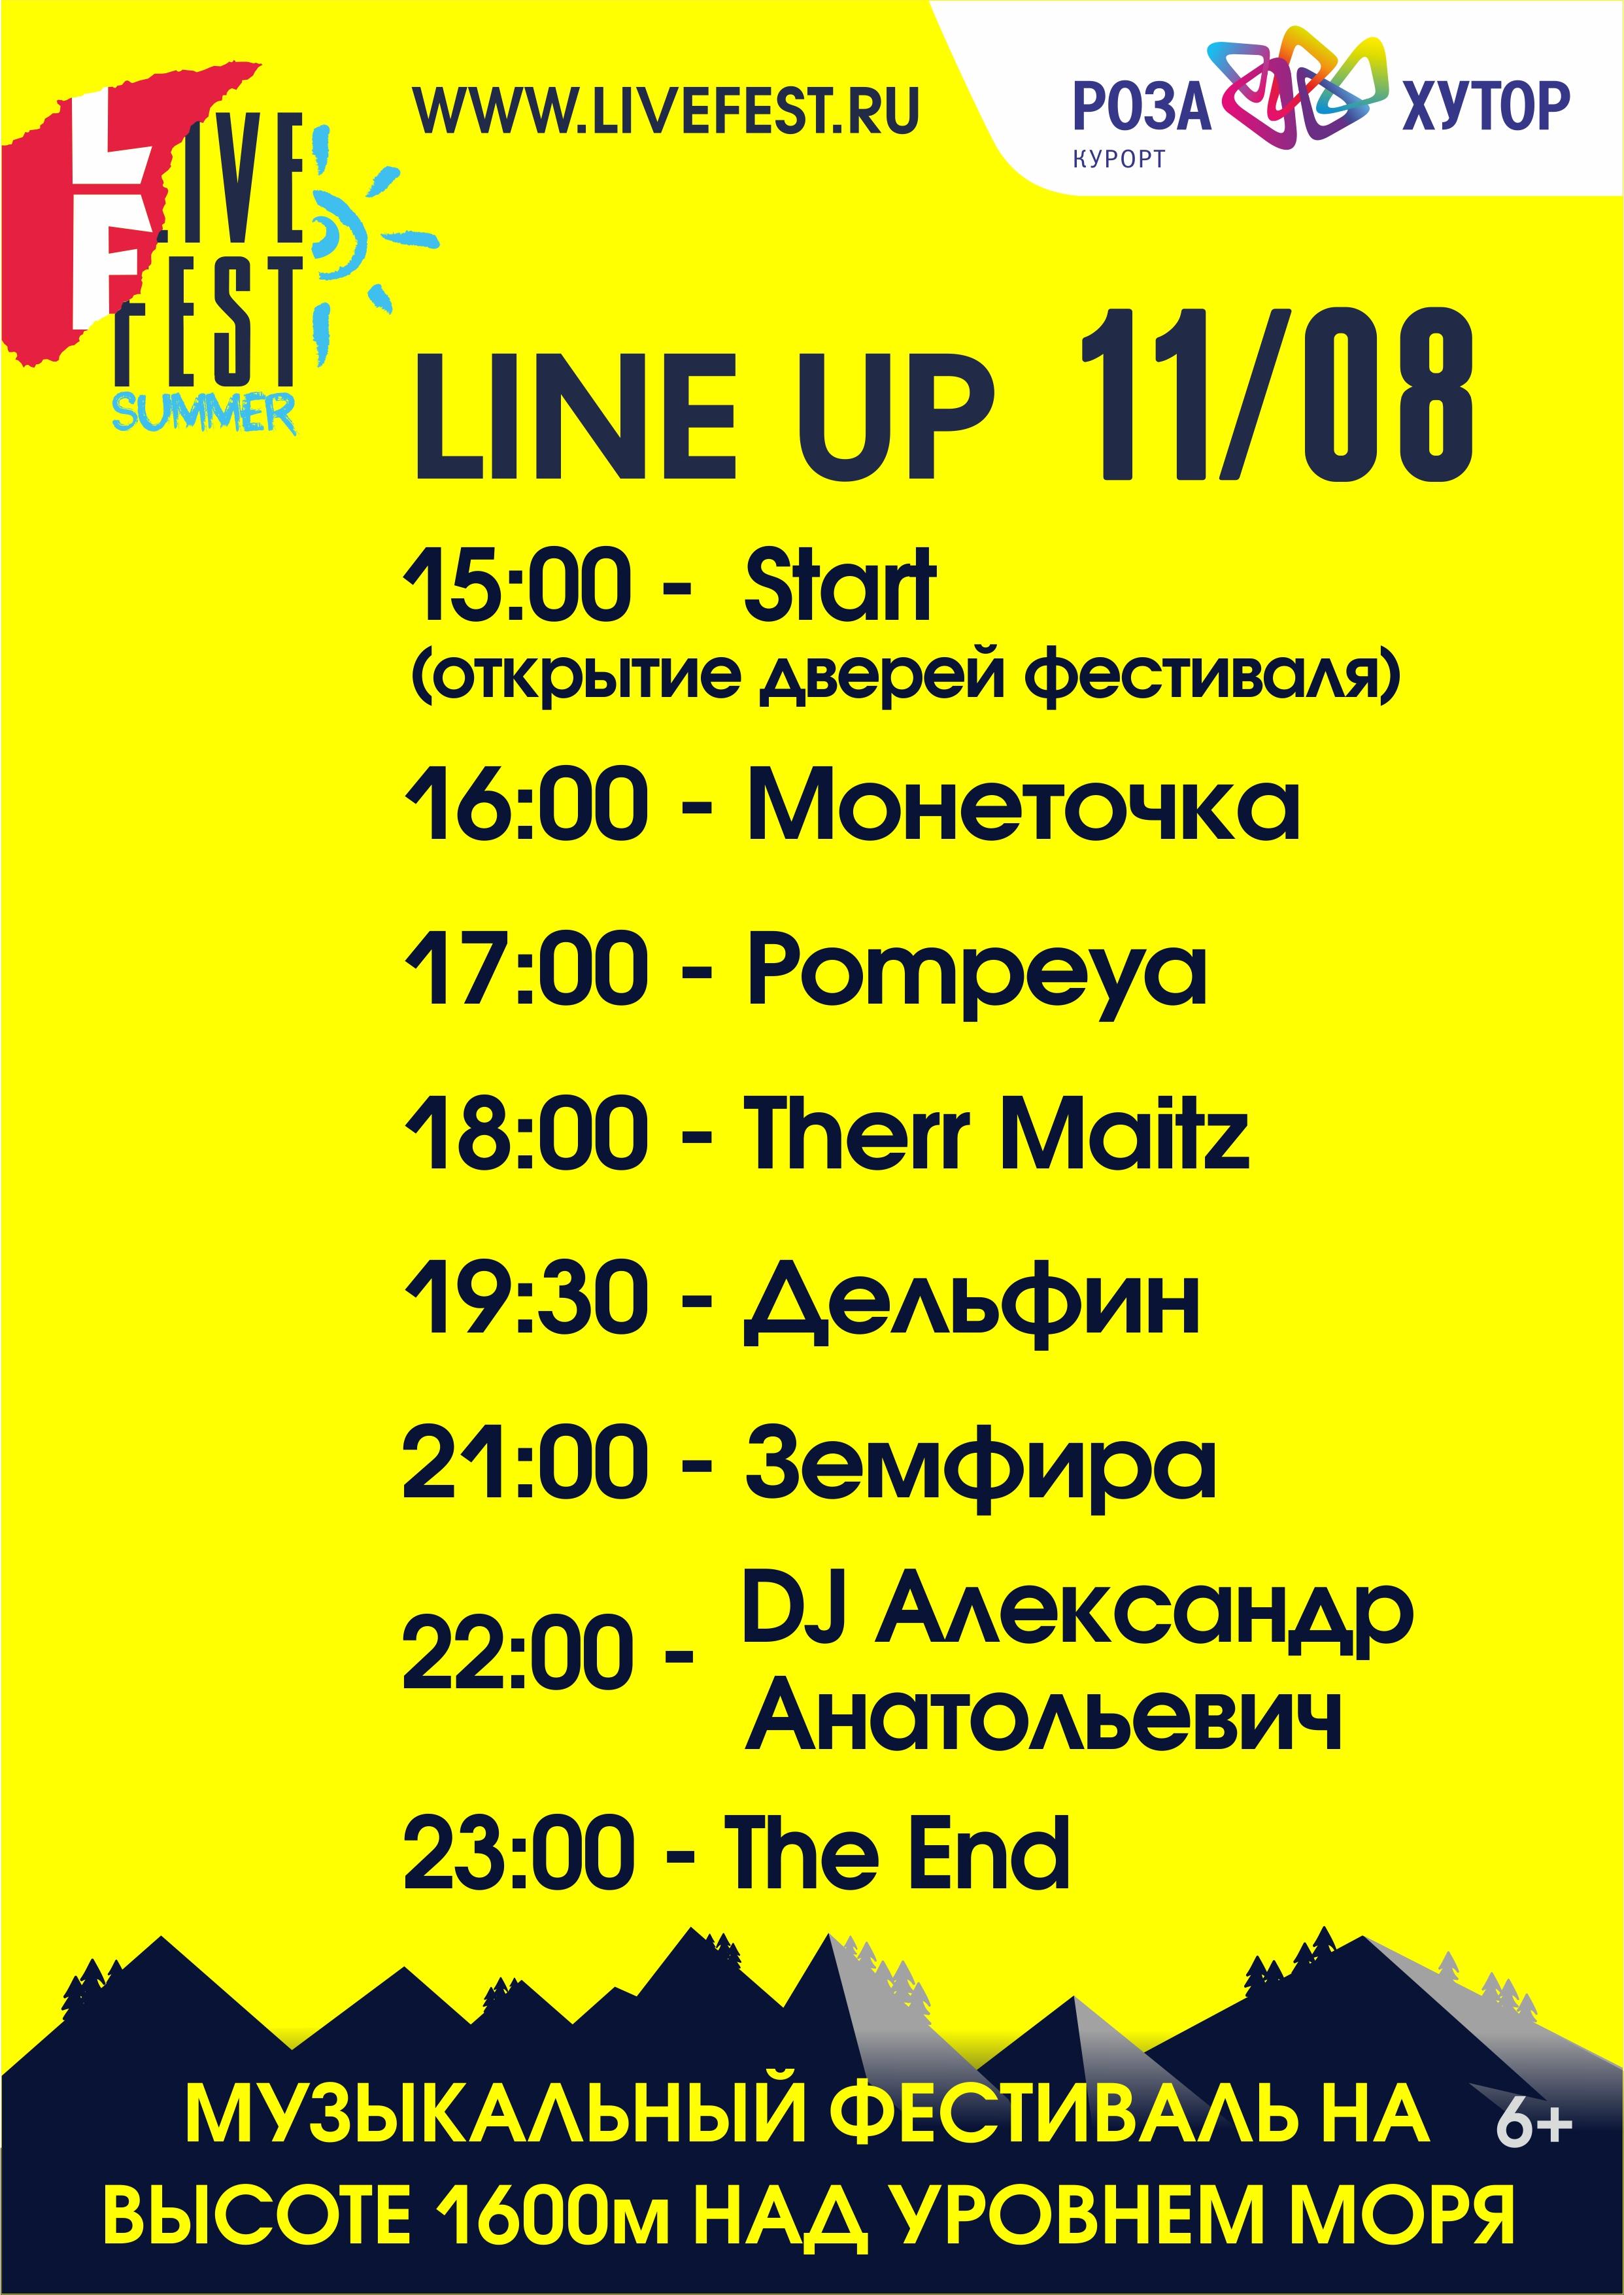 Live Fest Summer фестиваль